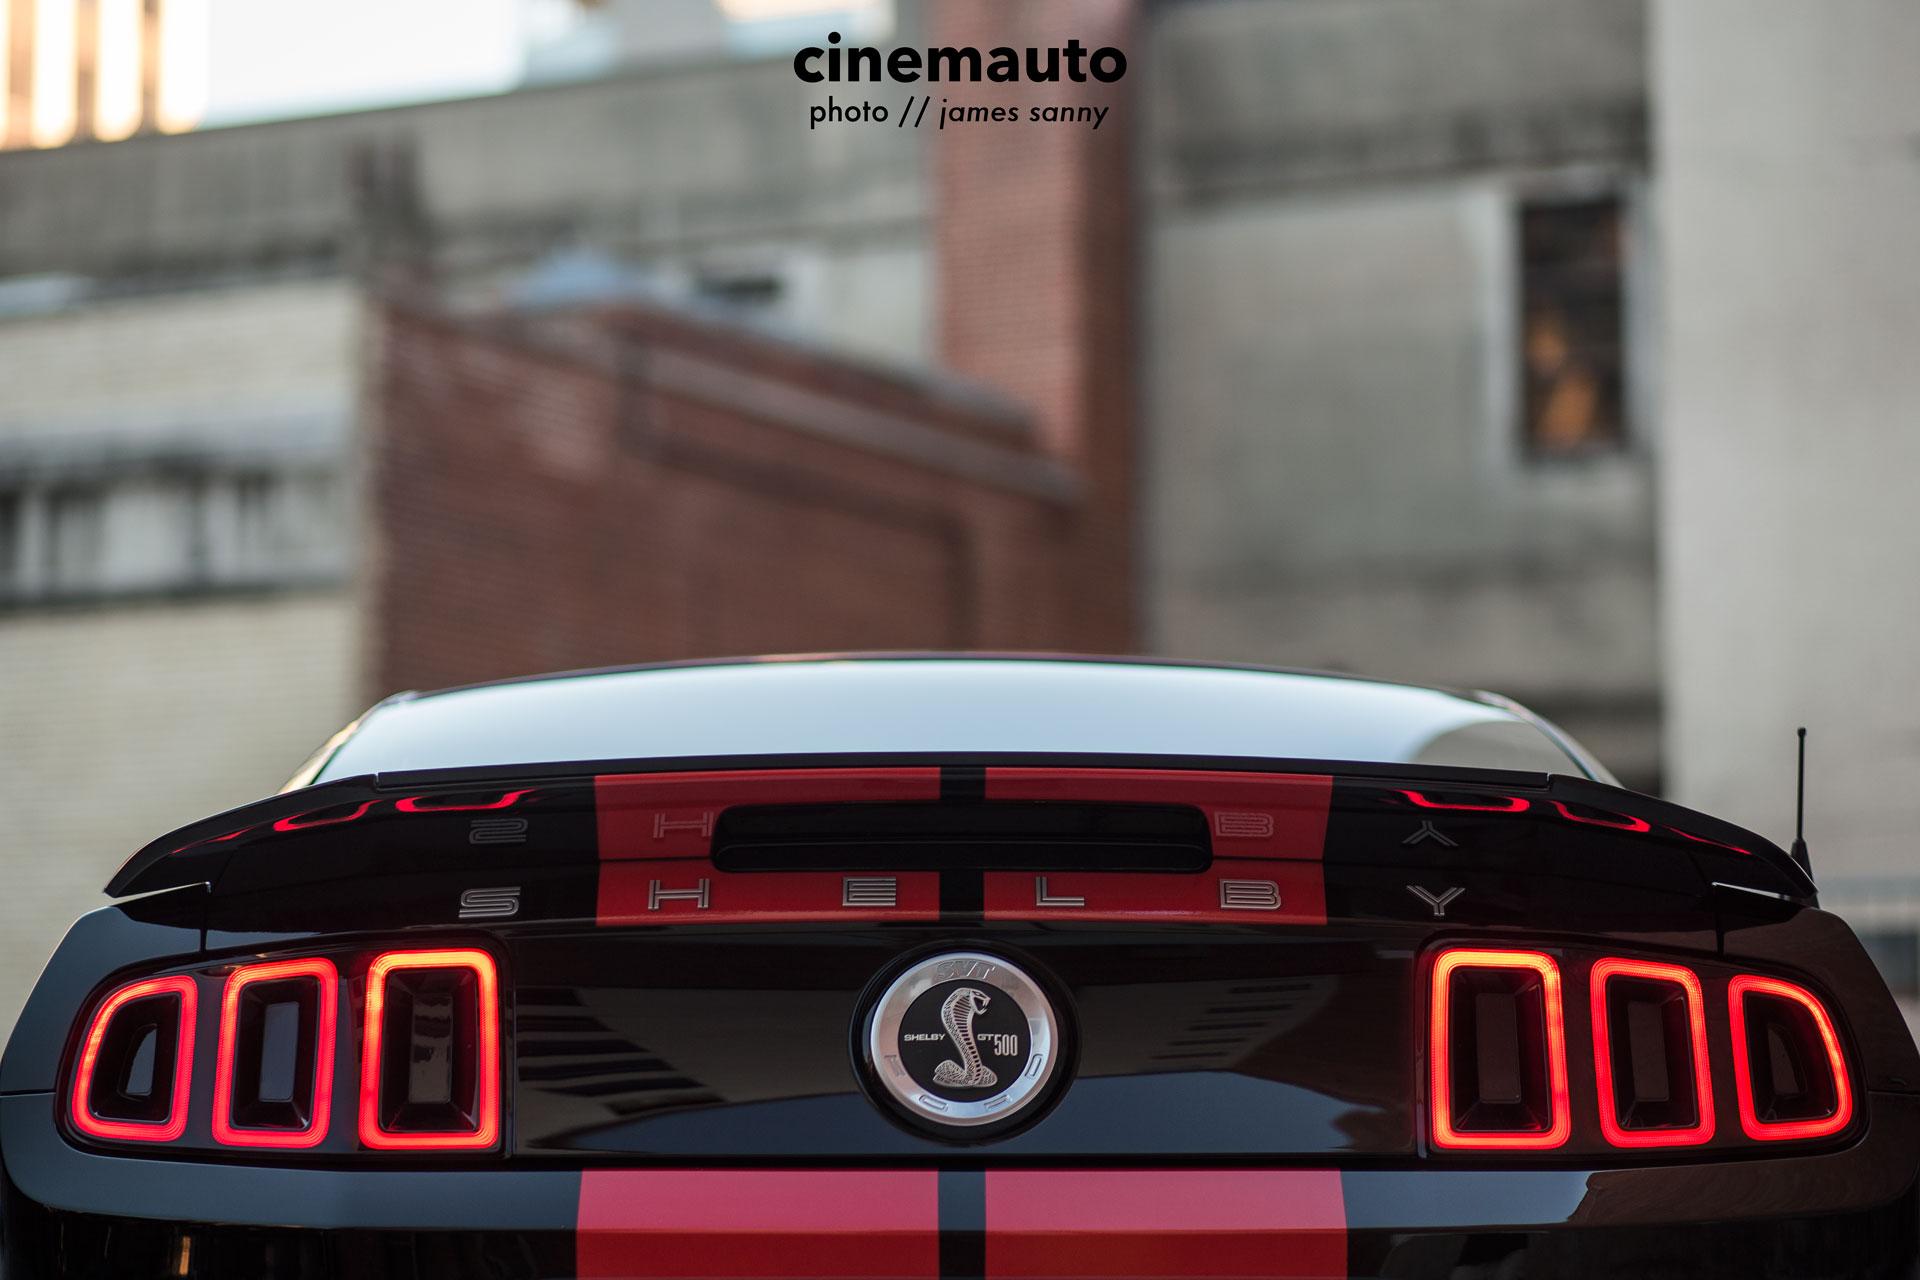 cinemauto-wichita-automotive-photography-cj16a.jpg